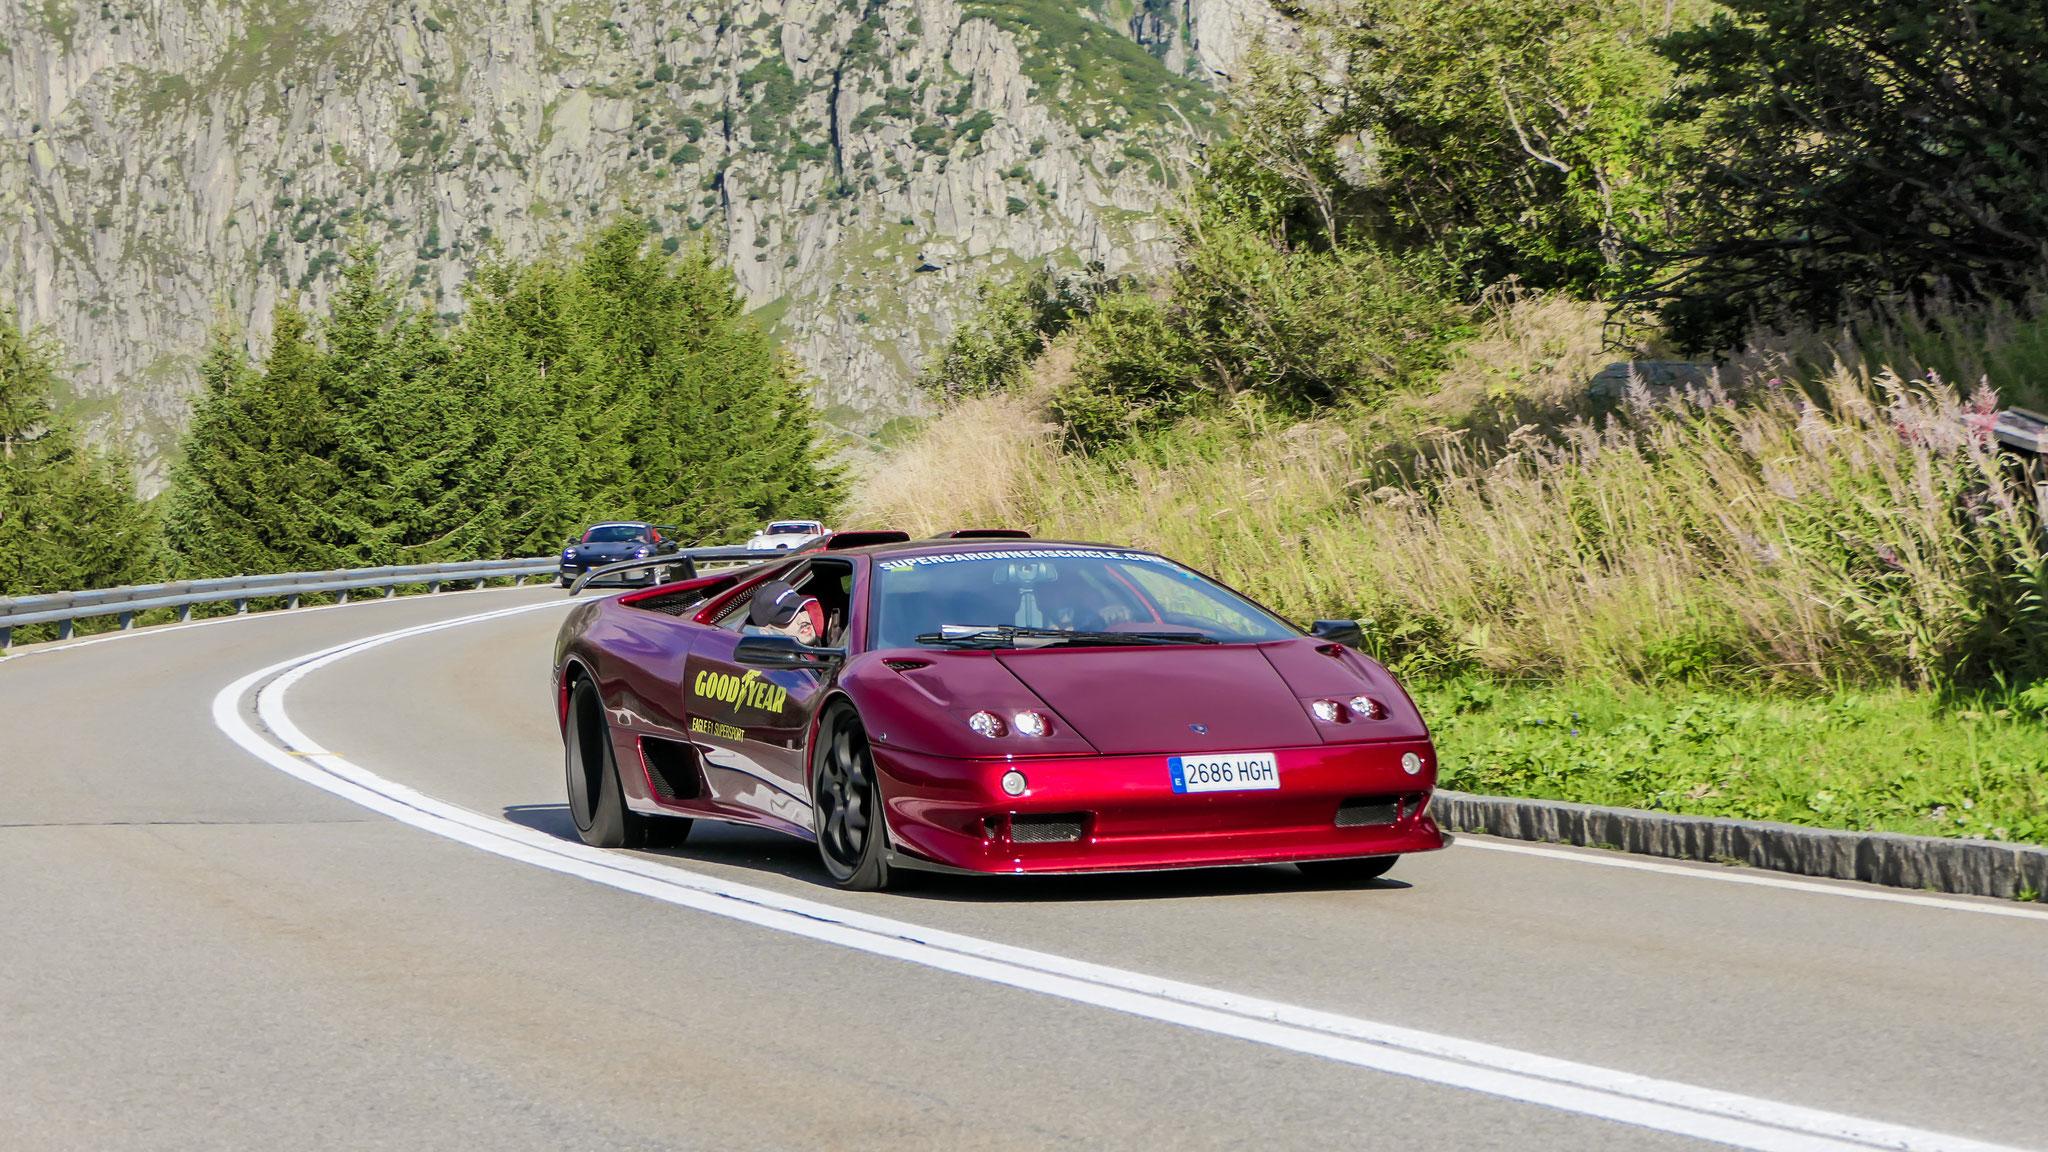 Lamborghini Diablo SV - 2686-HGH (ESP)